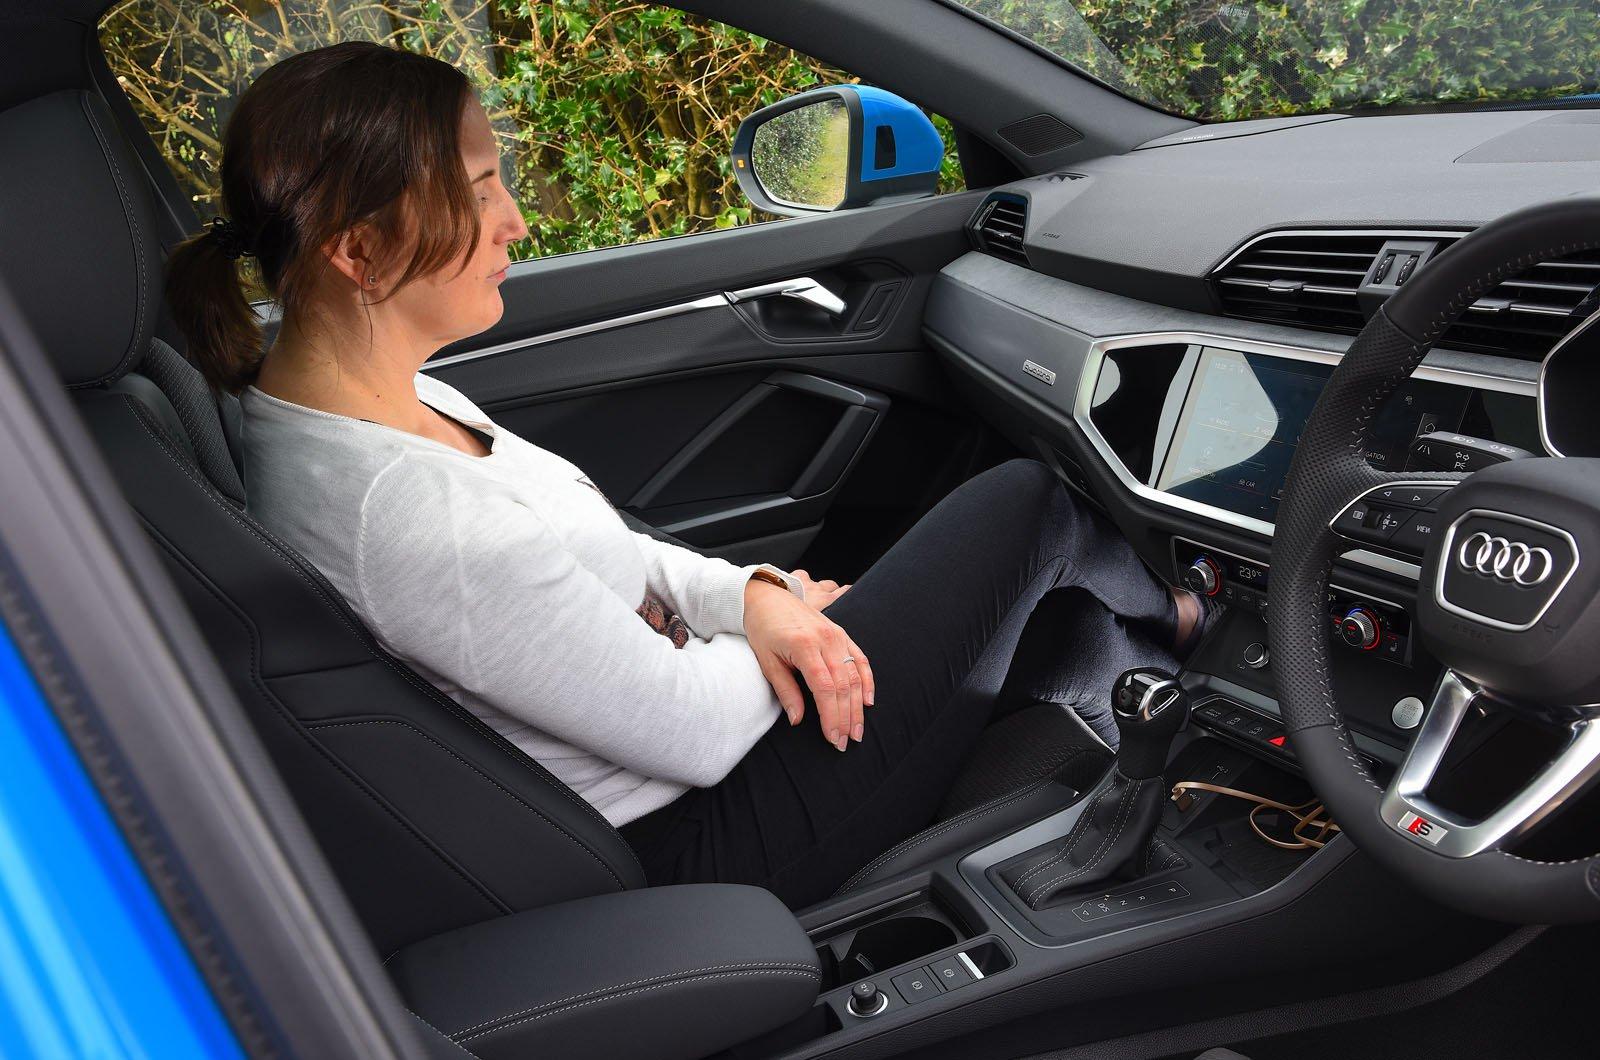 LT Audi Q3 Sportback - woman in the front passenger seat